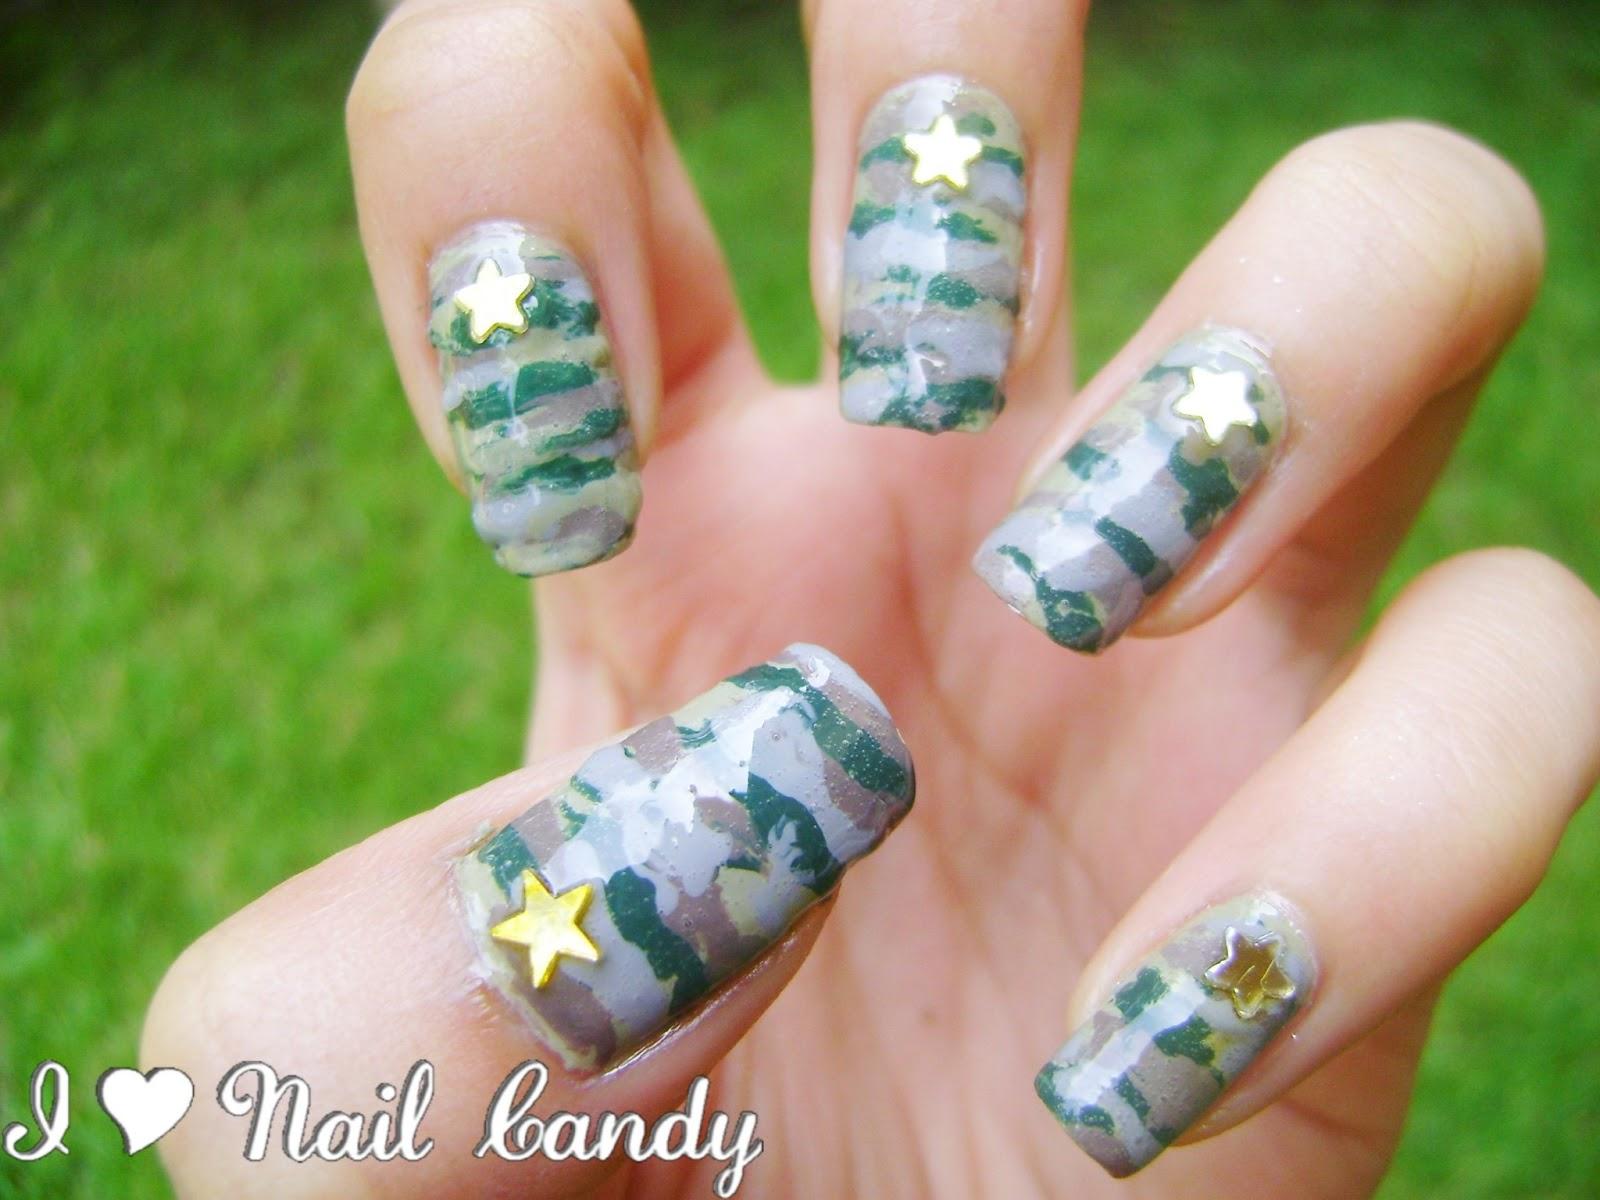 Camo Nail Art Tutorial I chose a camouflage nail artCamo Nail Art Tutorial